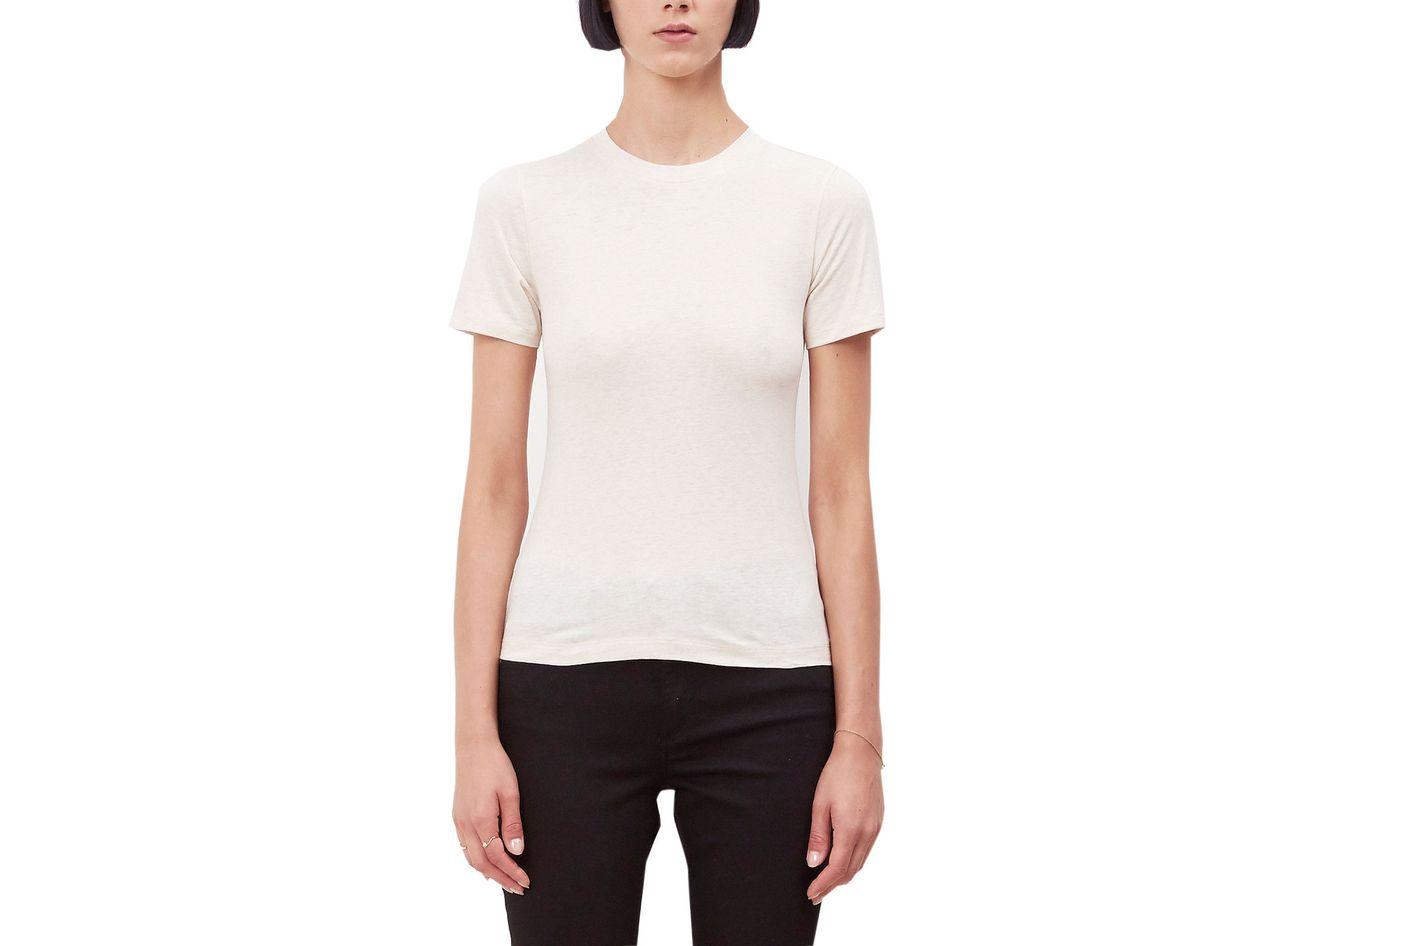 Acne Studios Beige Crewneck T-shirt